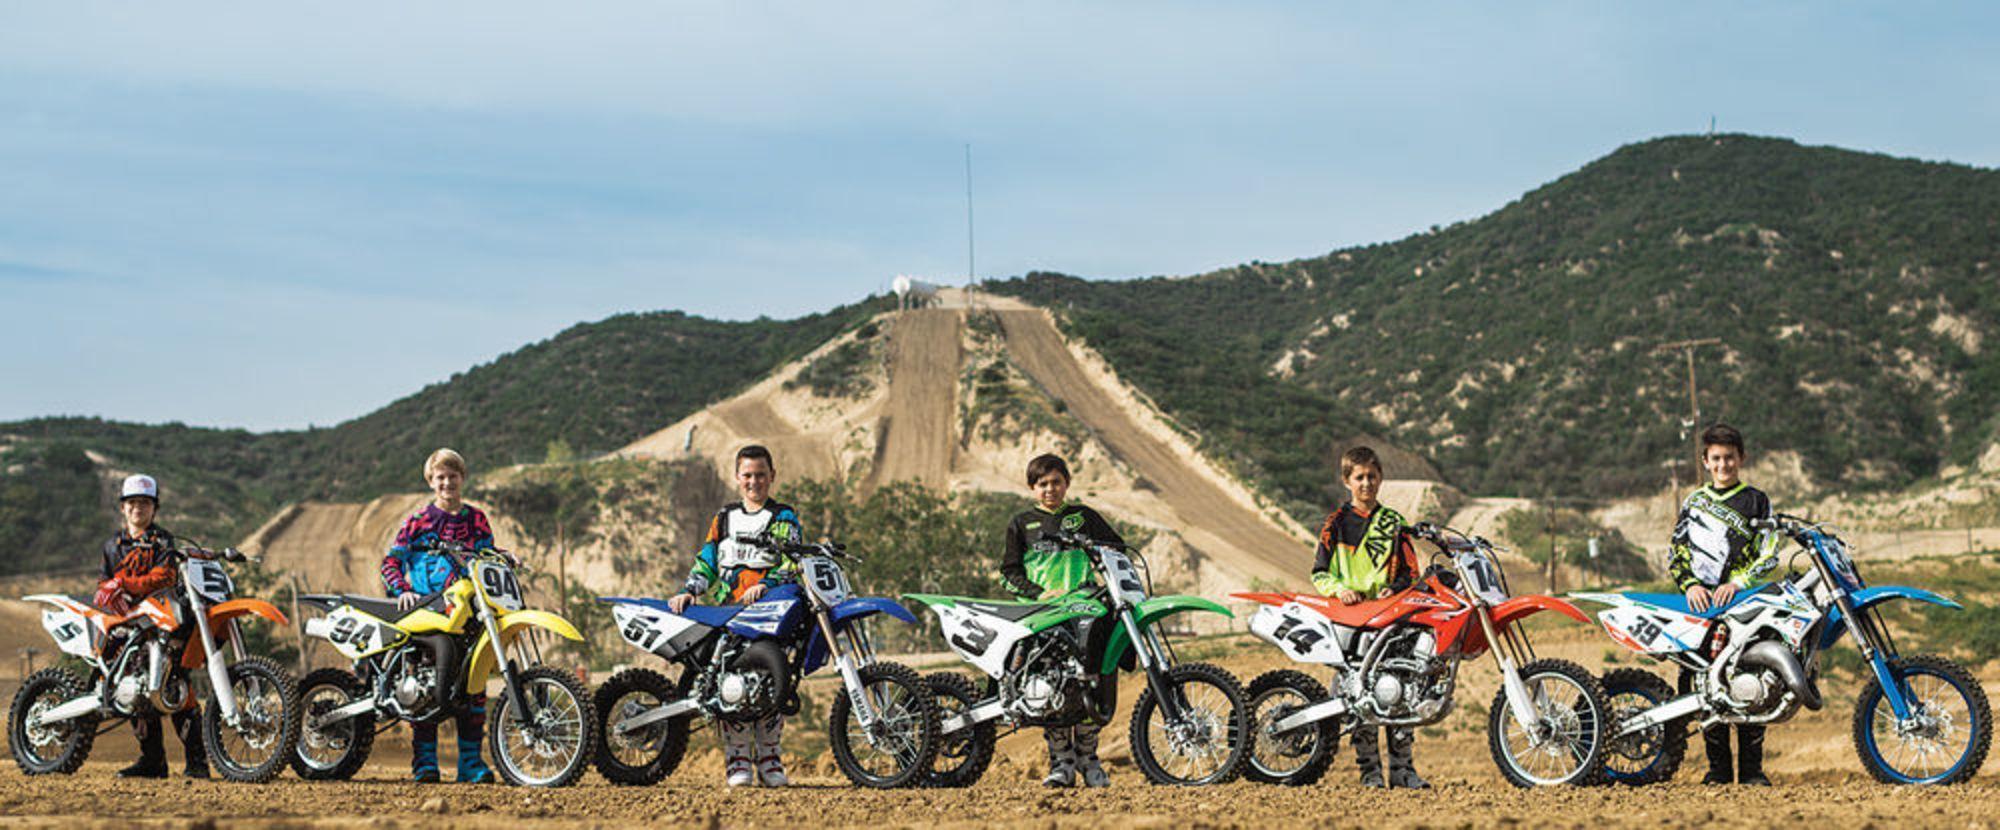 2016 Dirt Rider 85cc Mx Shootout Motocross Motocross Bikes Ktm